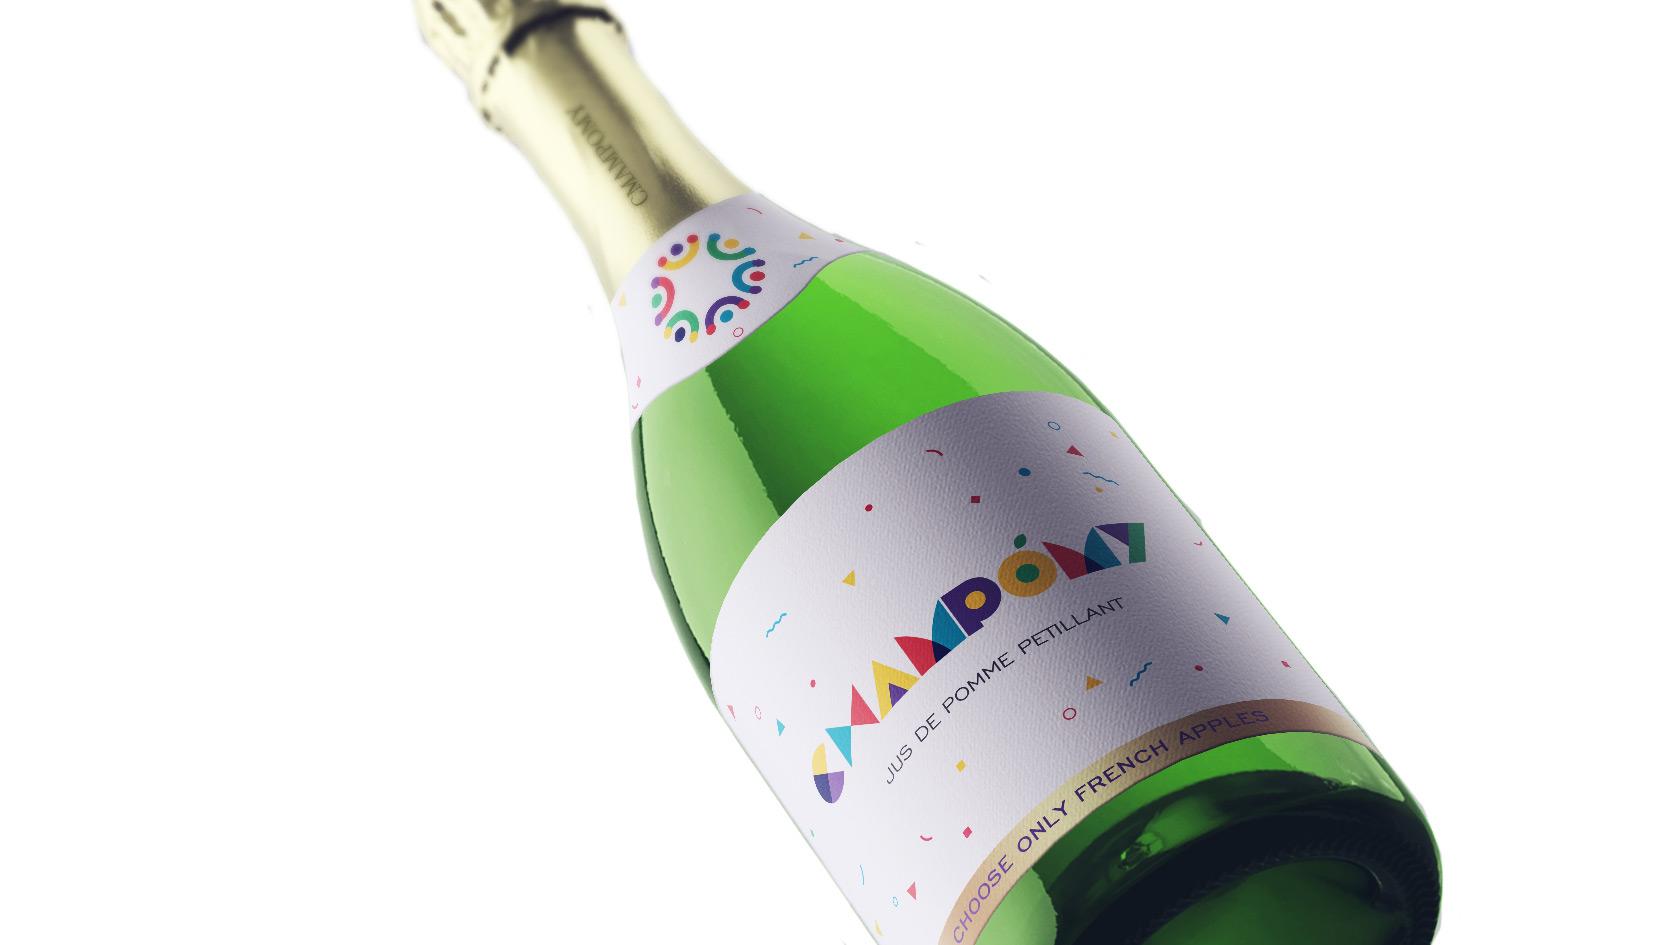 香槟logo9